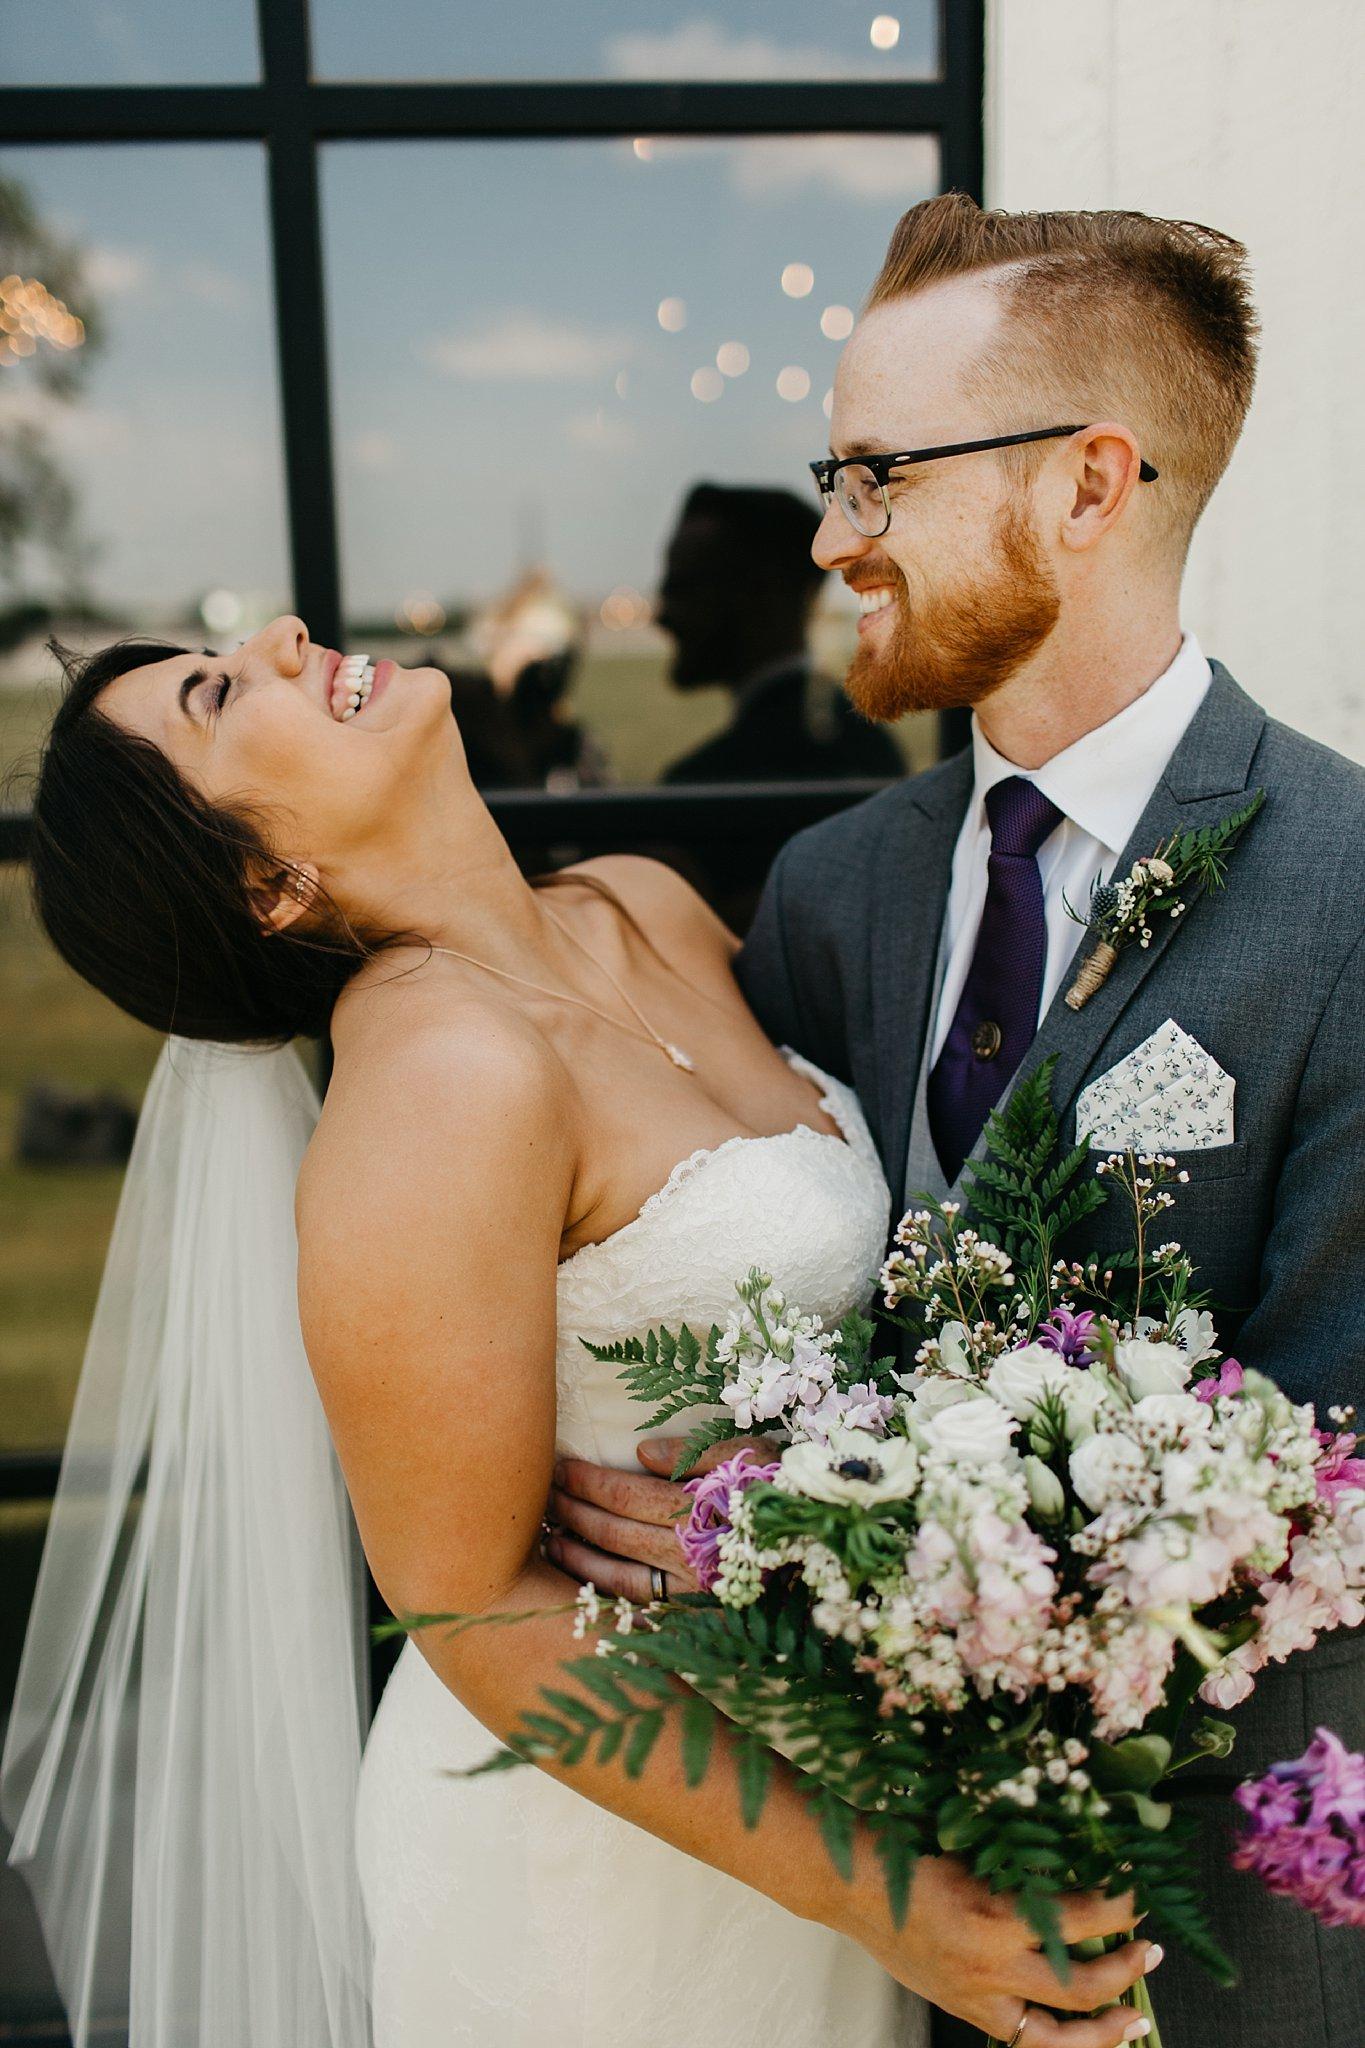 Wilderlove Co_Aubrey Texas_The Milestone_Engagement Wedding Photography_0182.jpg